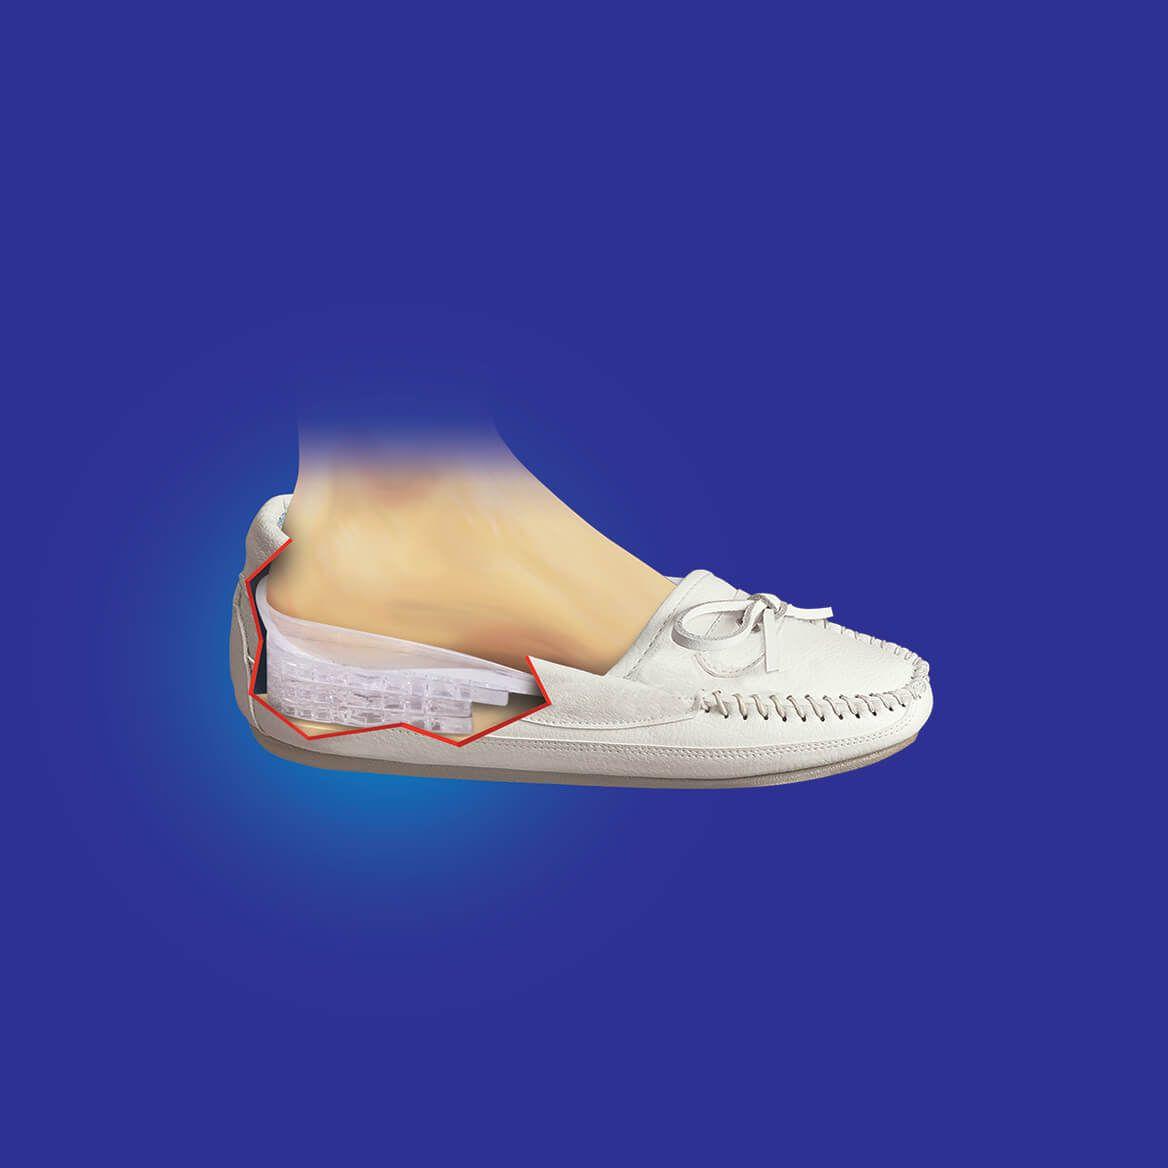 Adjustable Heel Height Gel Inserts by Silver Steps™-367511